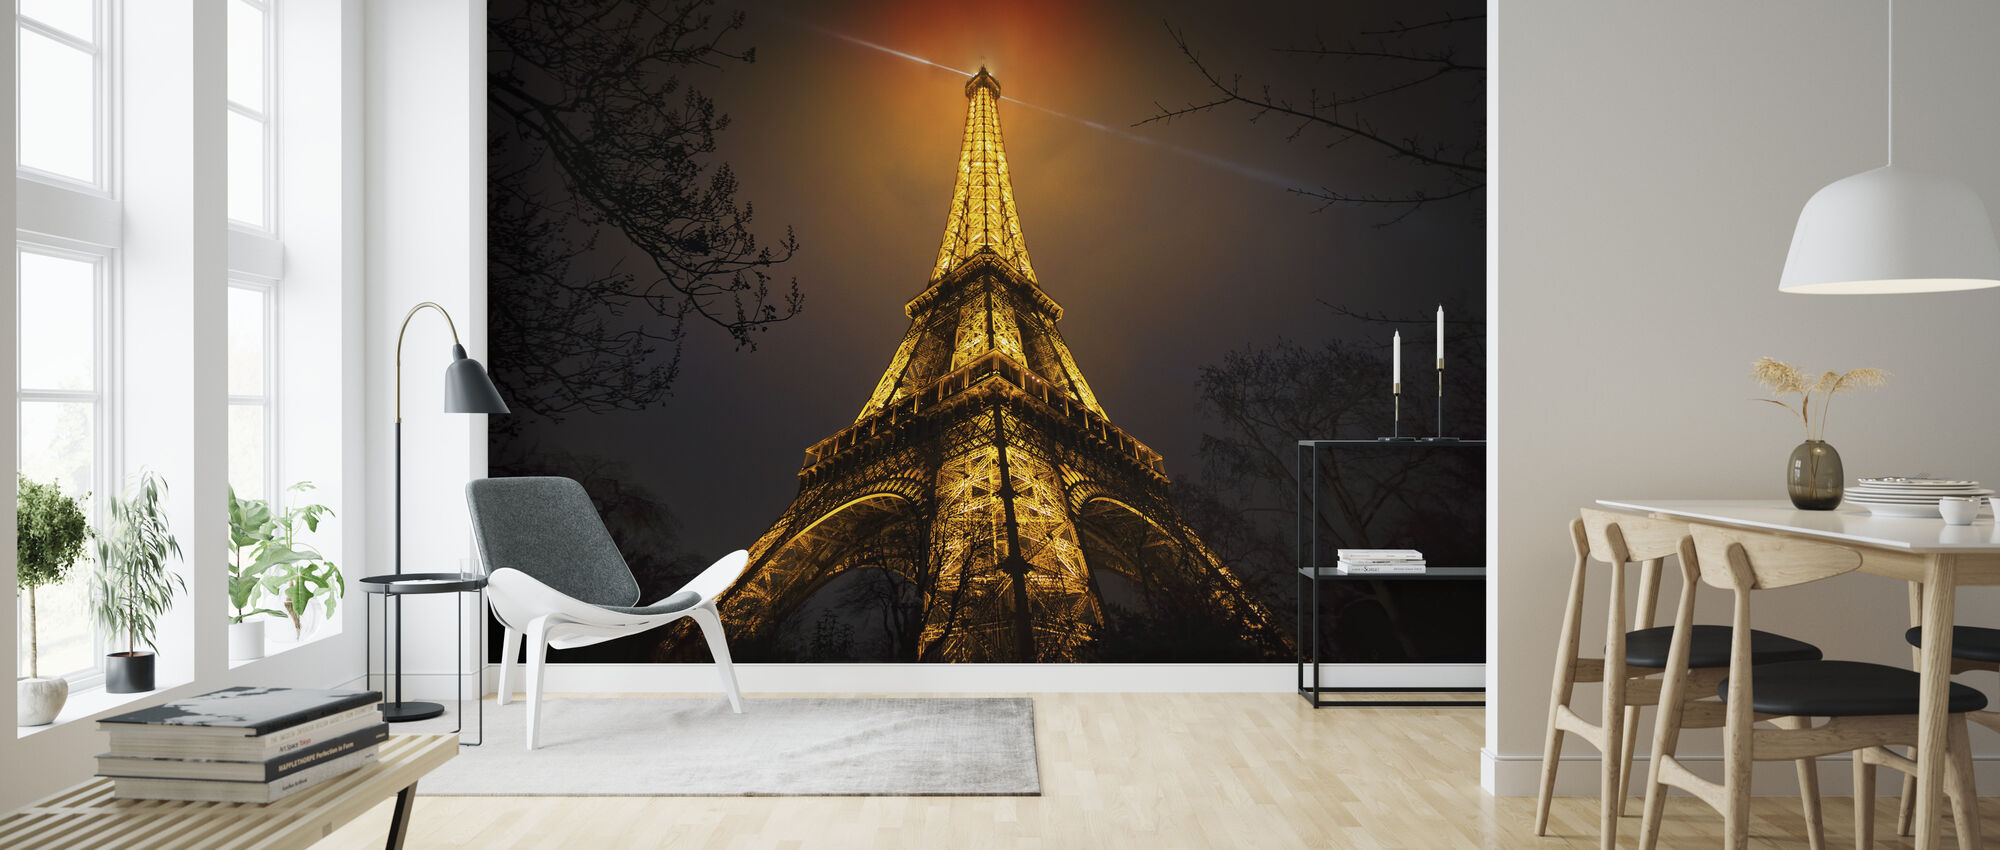 La Tour Eiffel - Wallpaper - Living Room